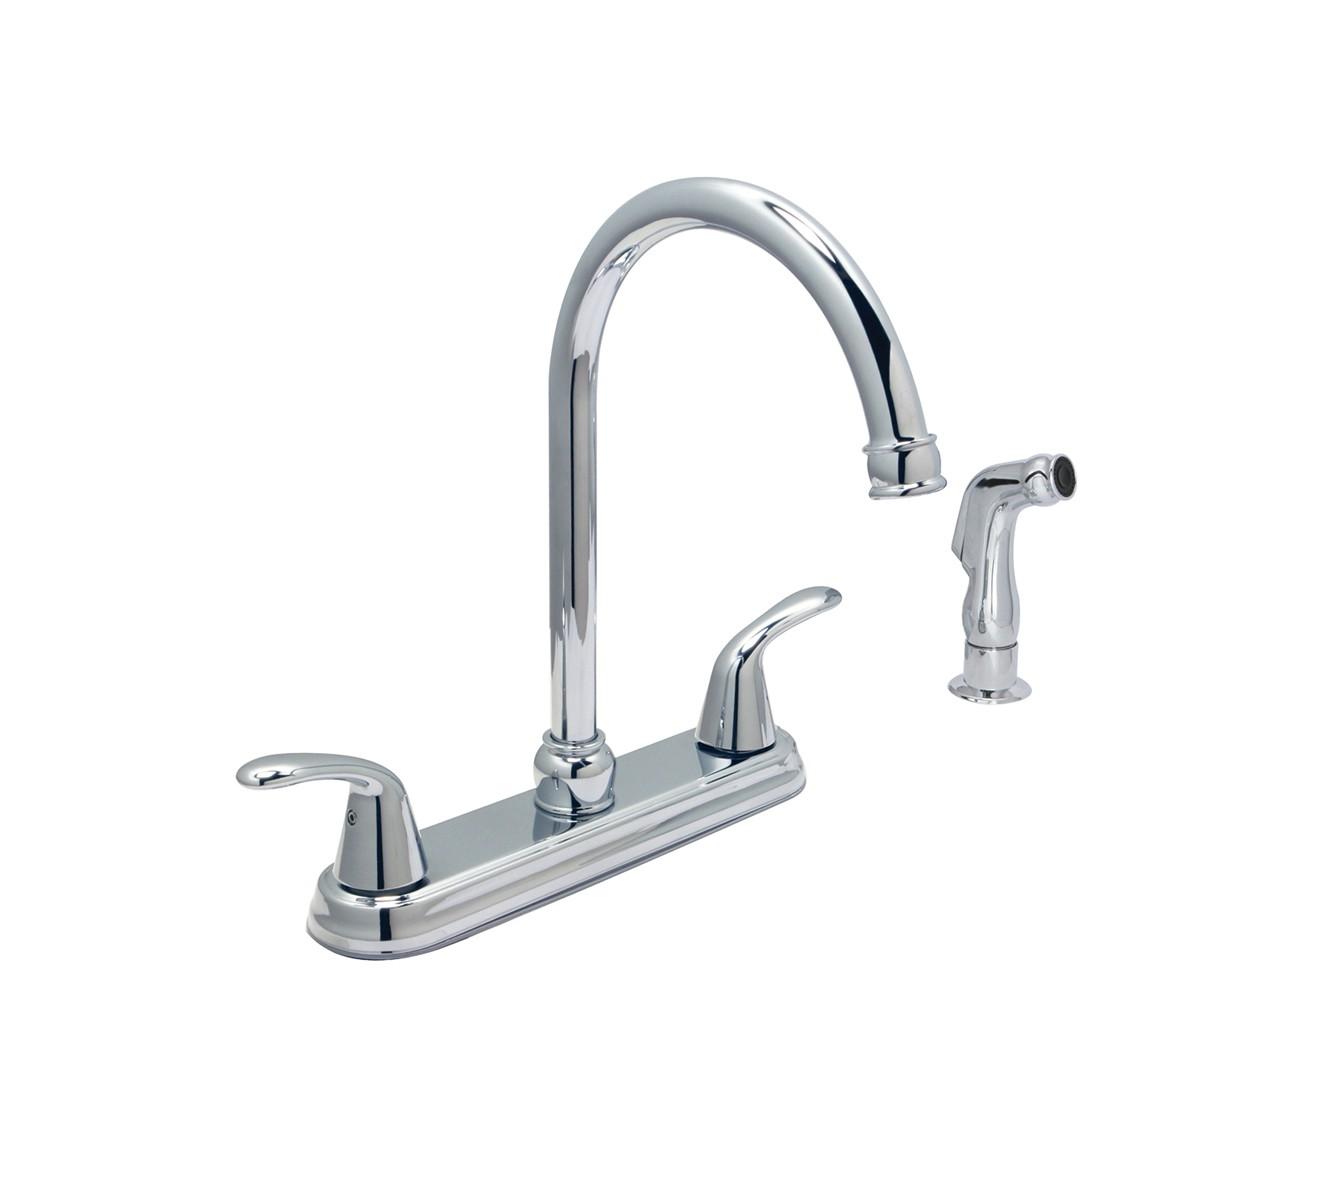 trend kitchen faucet  premier interior finishes